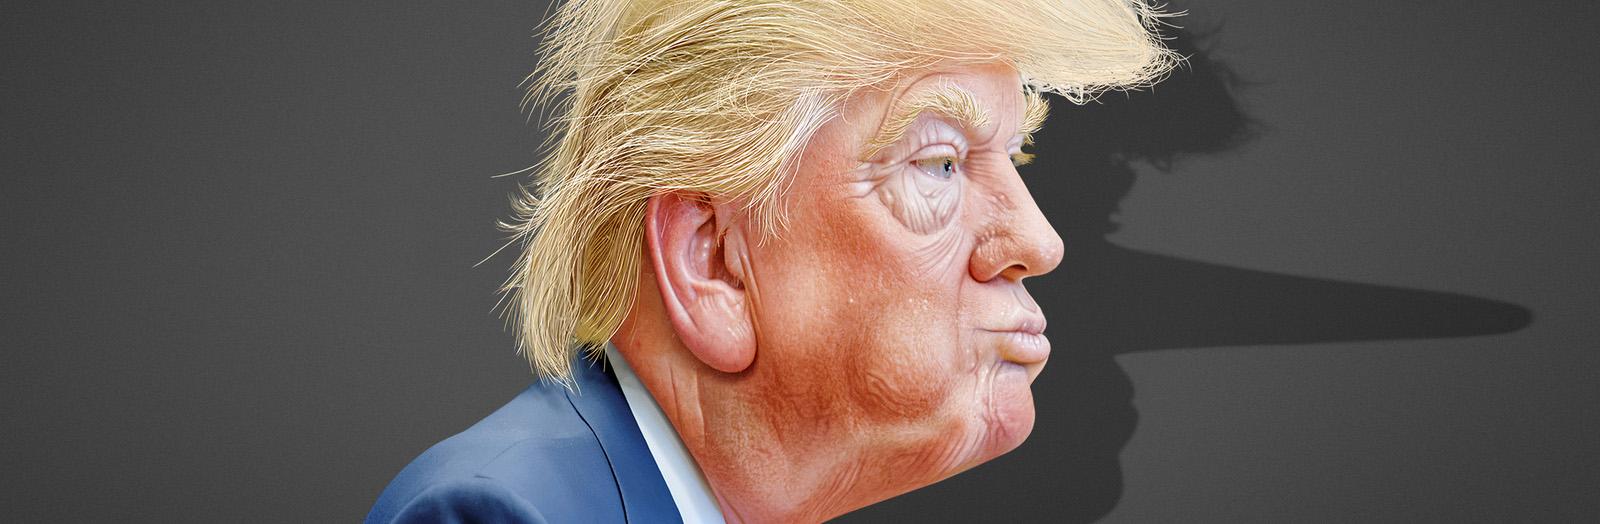 Dick Blumenthal's leverage — Trolling Trump